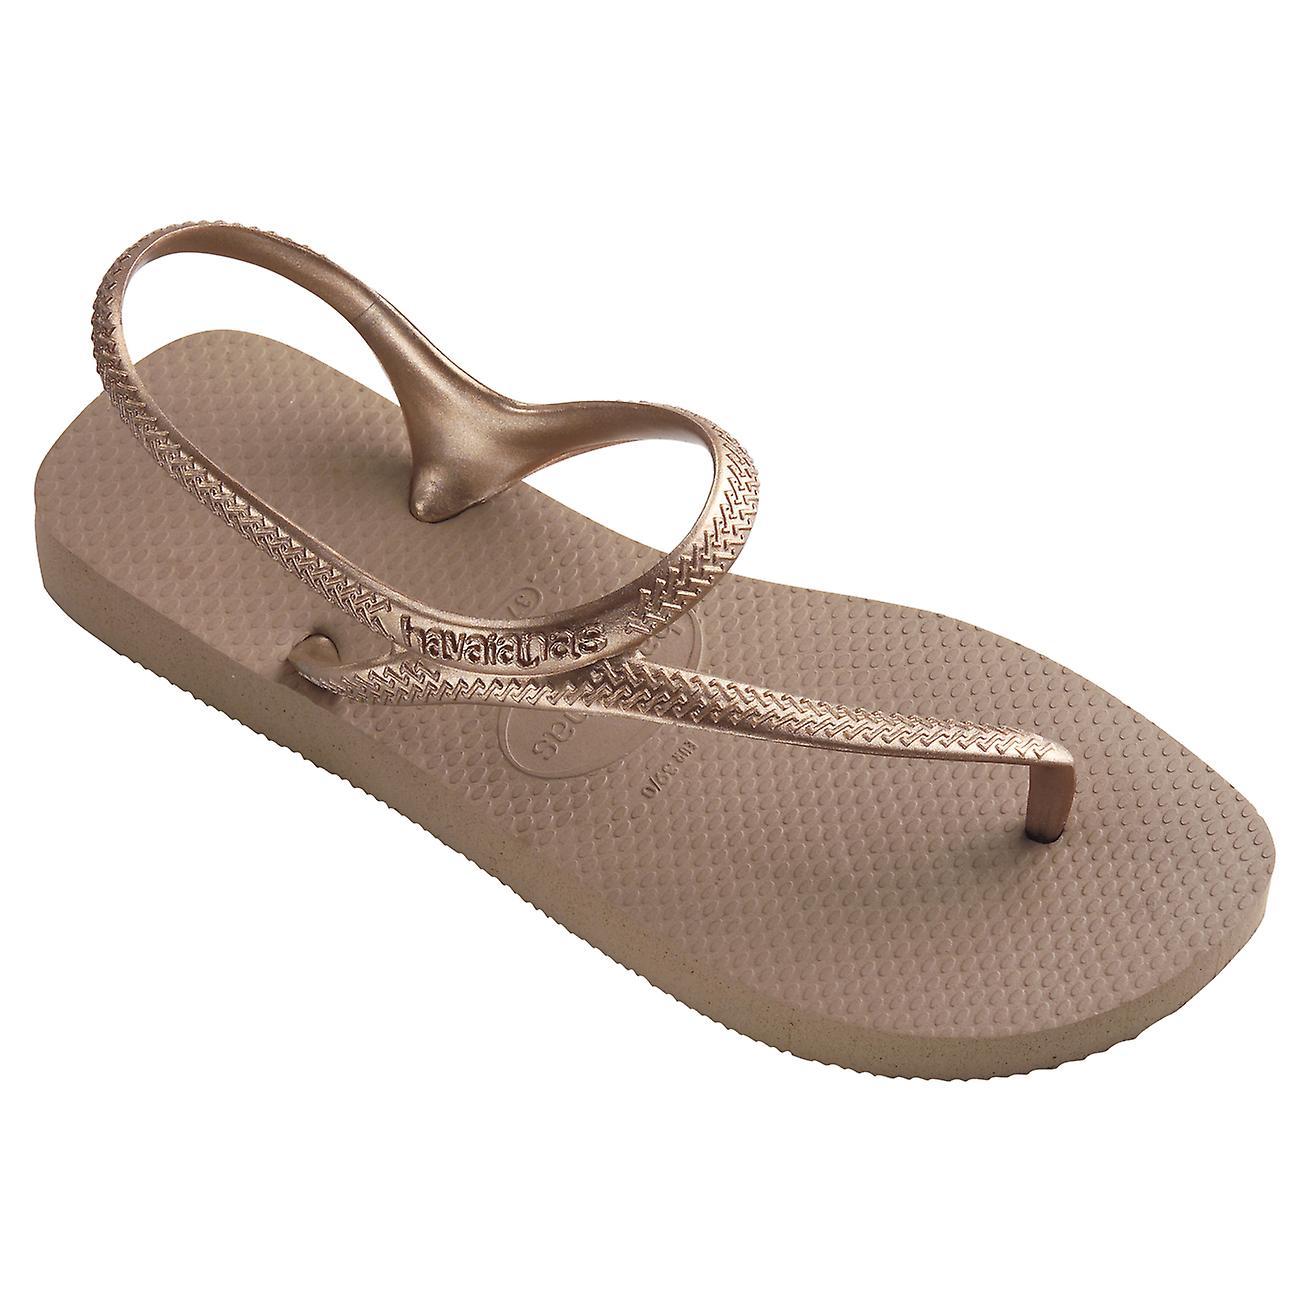 0f0acba35a5885 Womens Havaianas Flash Urban Lightweight Beach Strappy Sandals Flip Flops